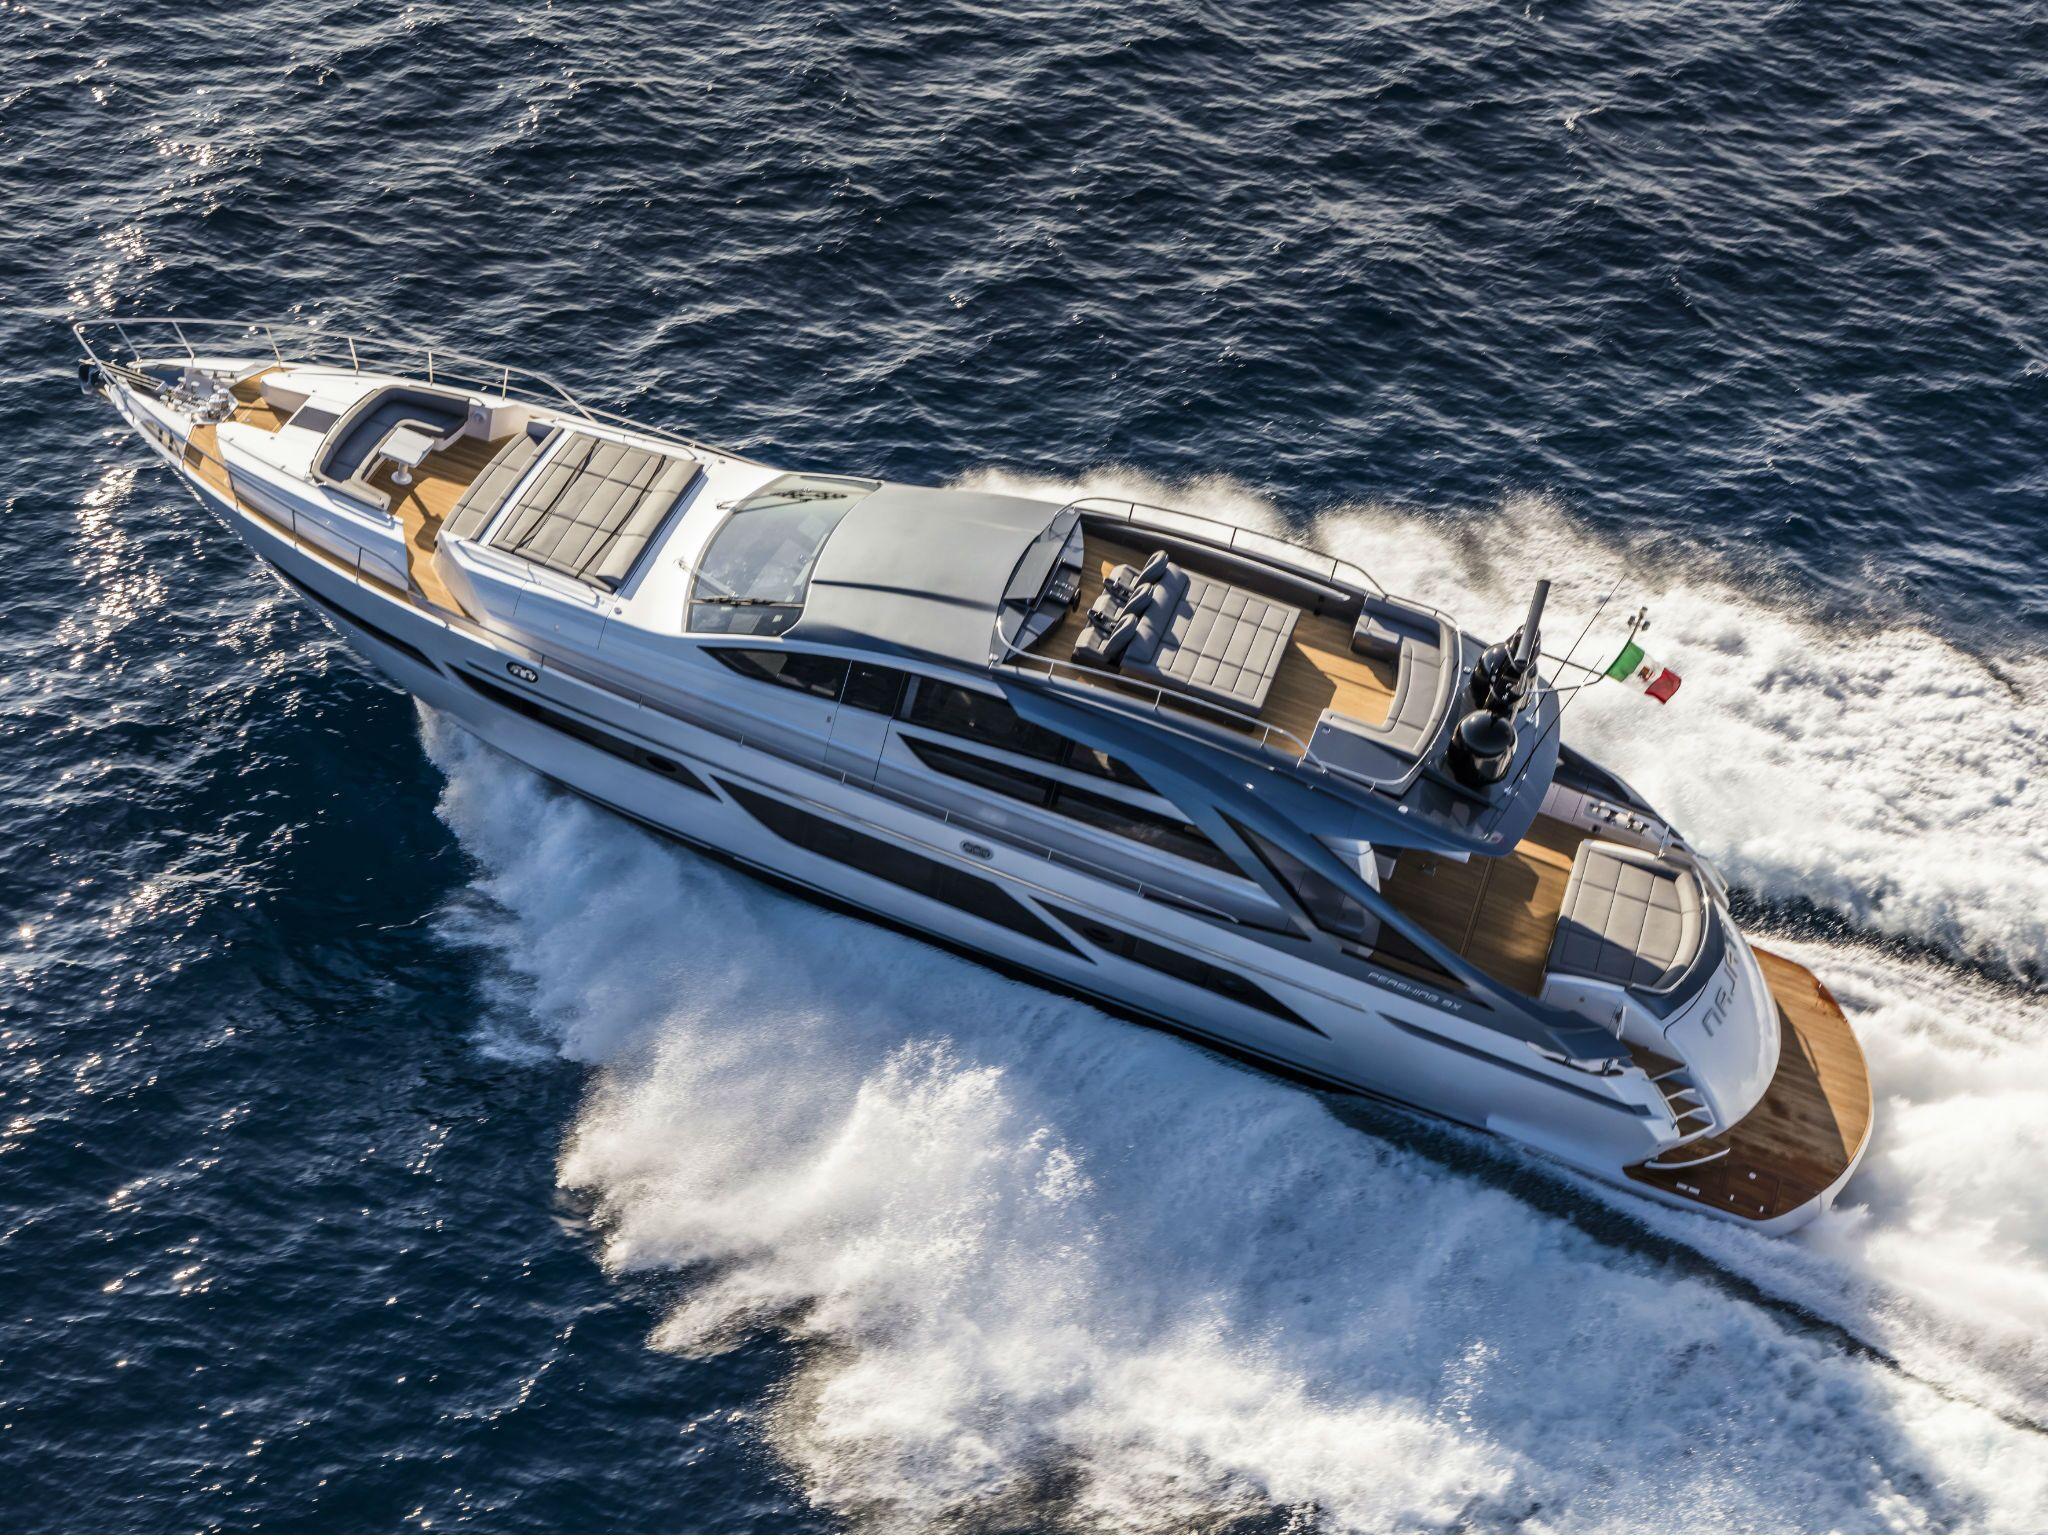 Pershing 9x Pershing Yachts Yacht Boat Yacht Design